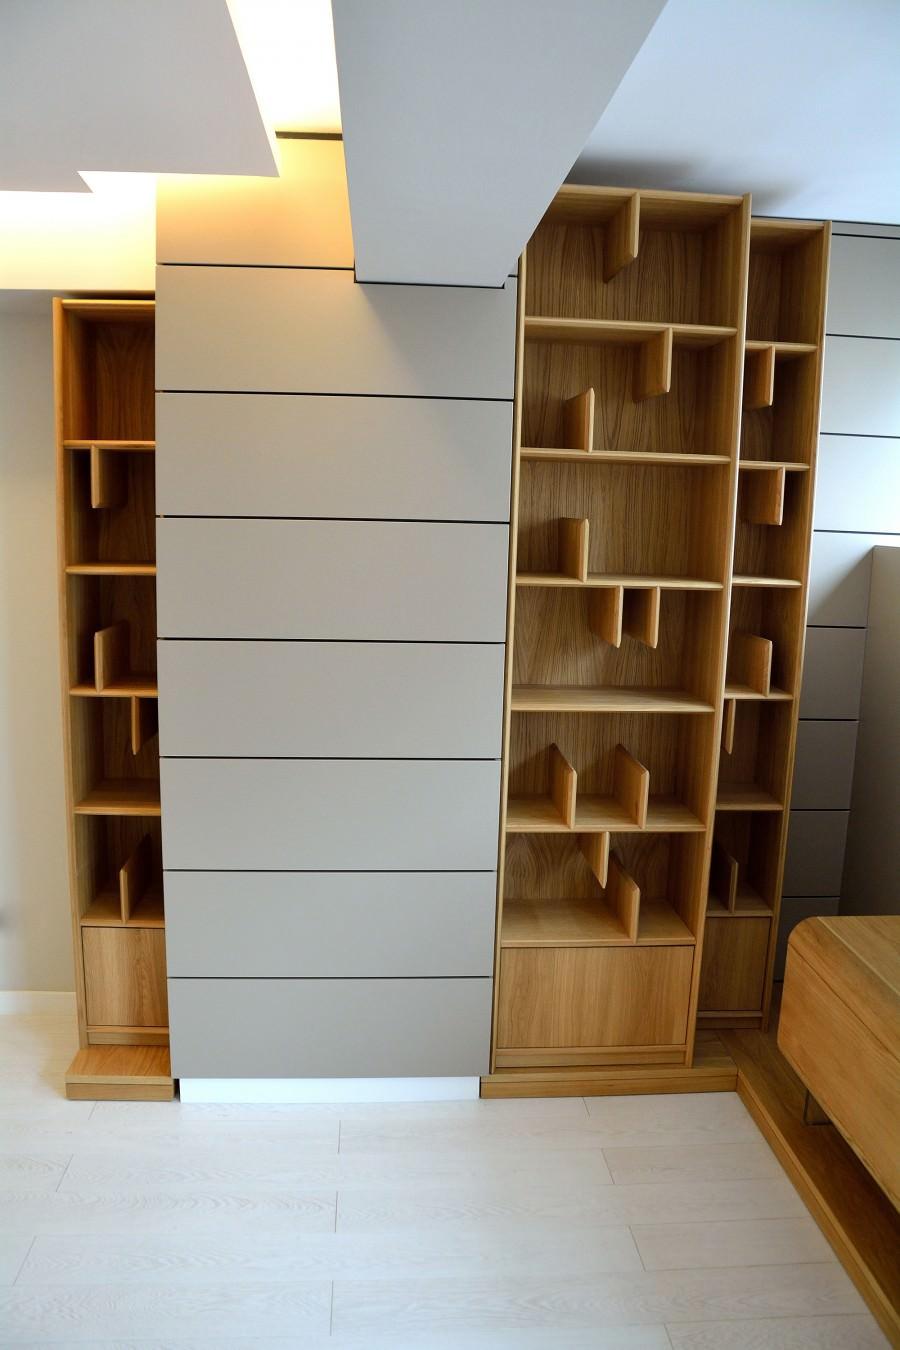 Biblioteca moderna realizata din Lemn masiv stejar natural plasata in living placat in intregime din Mdf Vopsit Mat Gri 900x1350 2